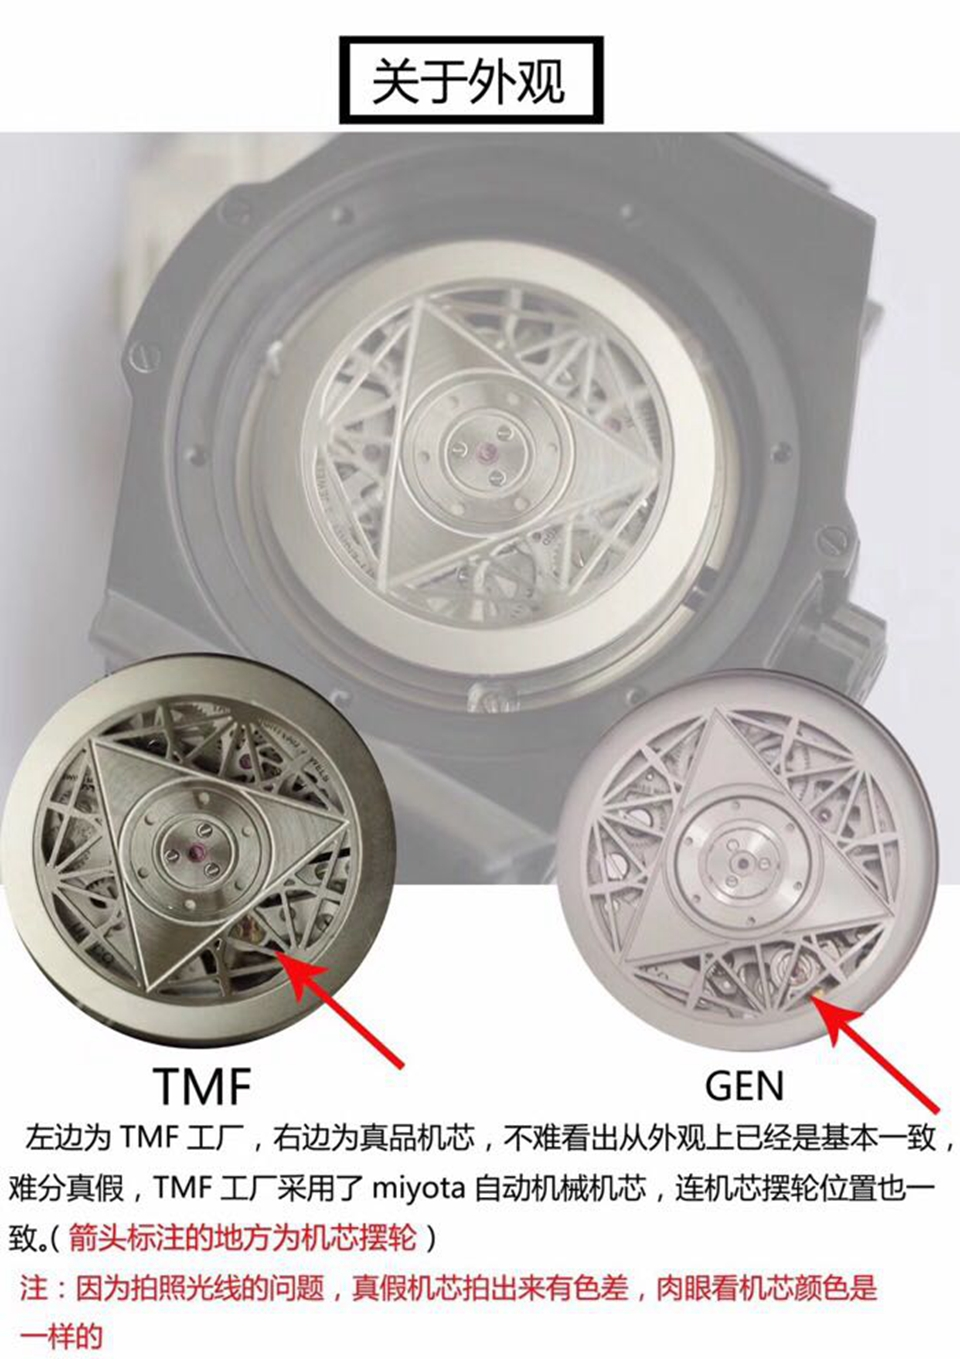 TMF宇舶BIG BANG系列415.NX.1112.VR.MXM16腕表